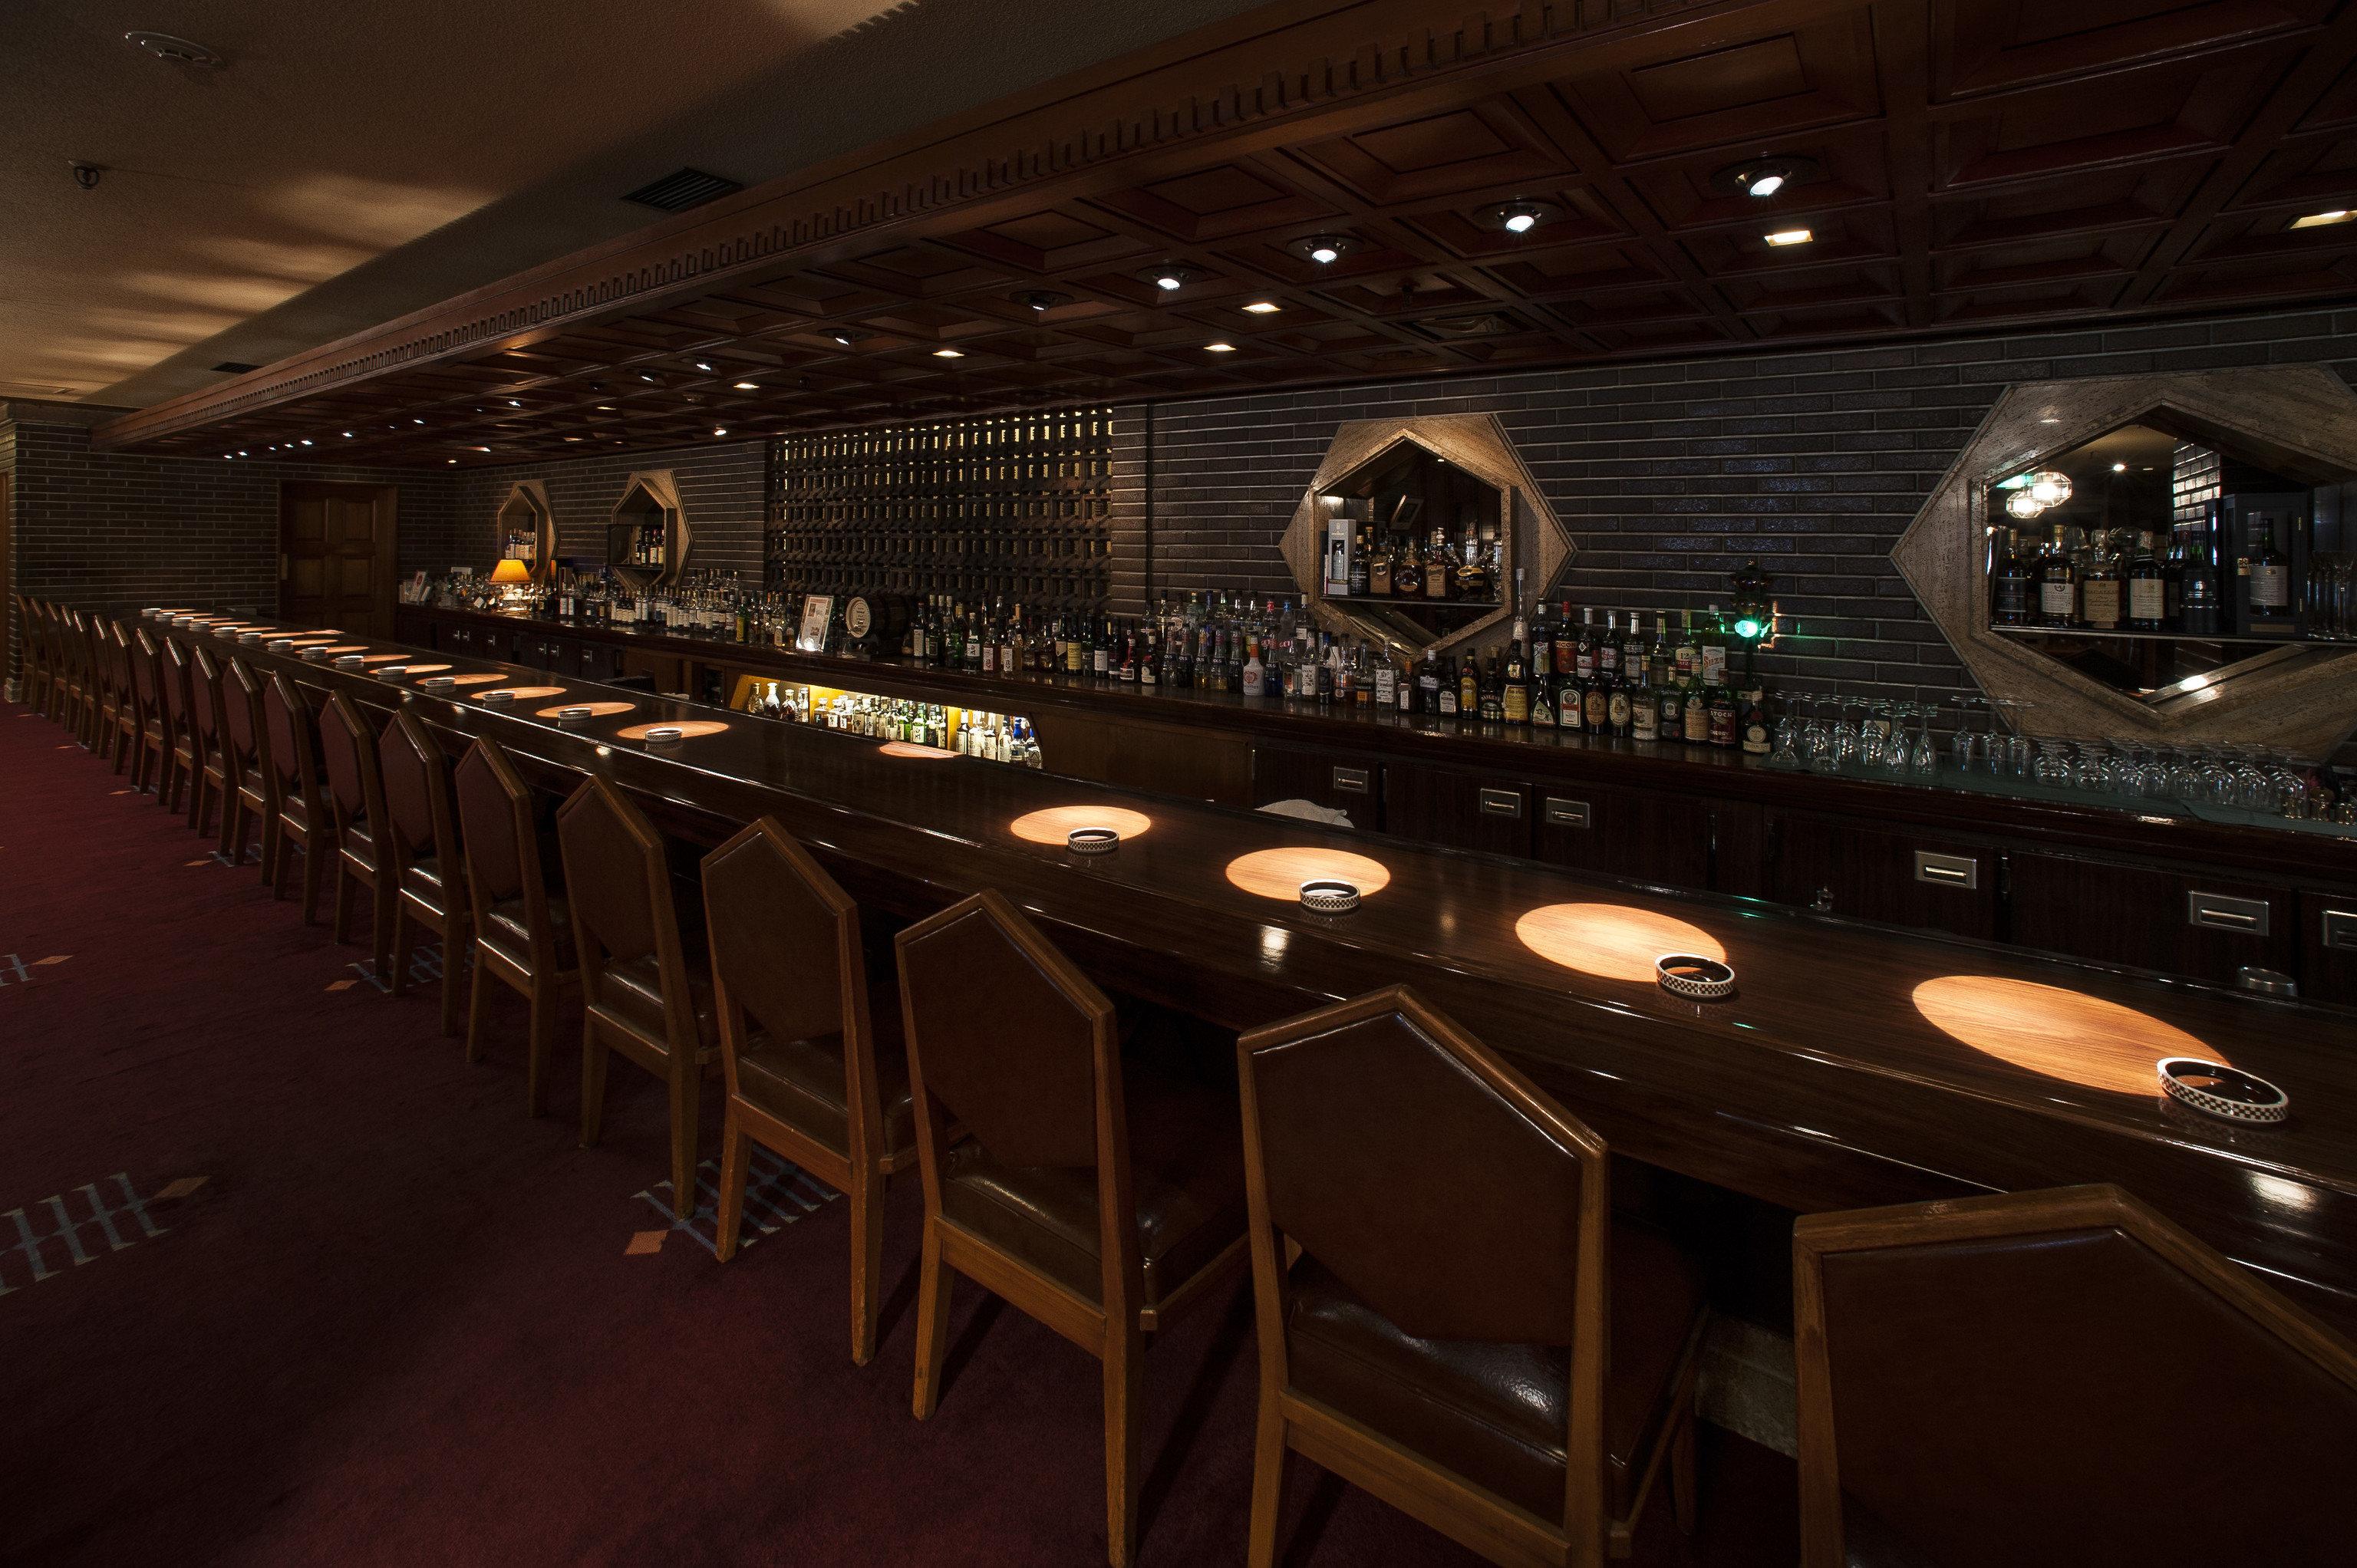 Hotels Japan Tokyo indoor floor ceiling auditorium stage function hall Bar restaurant